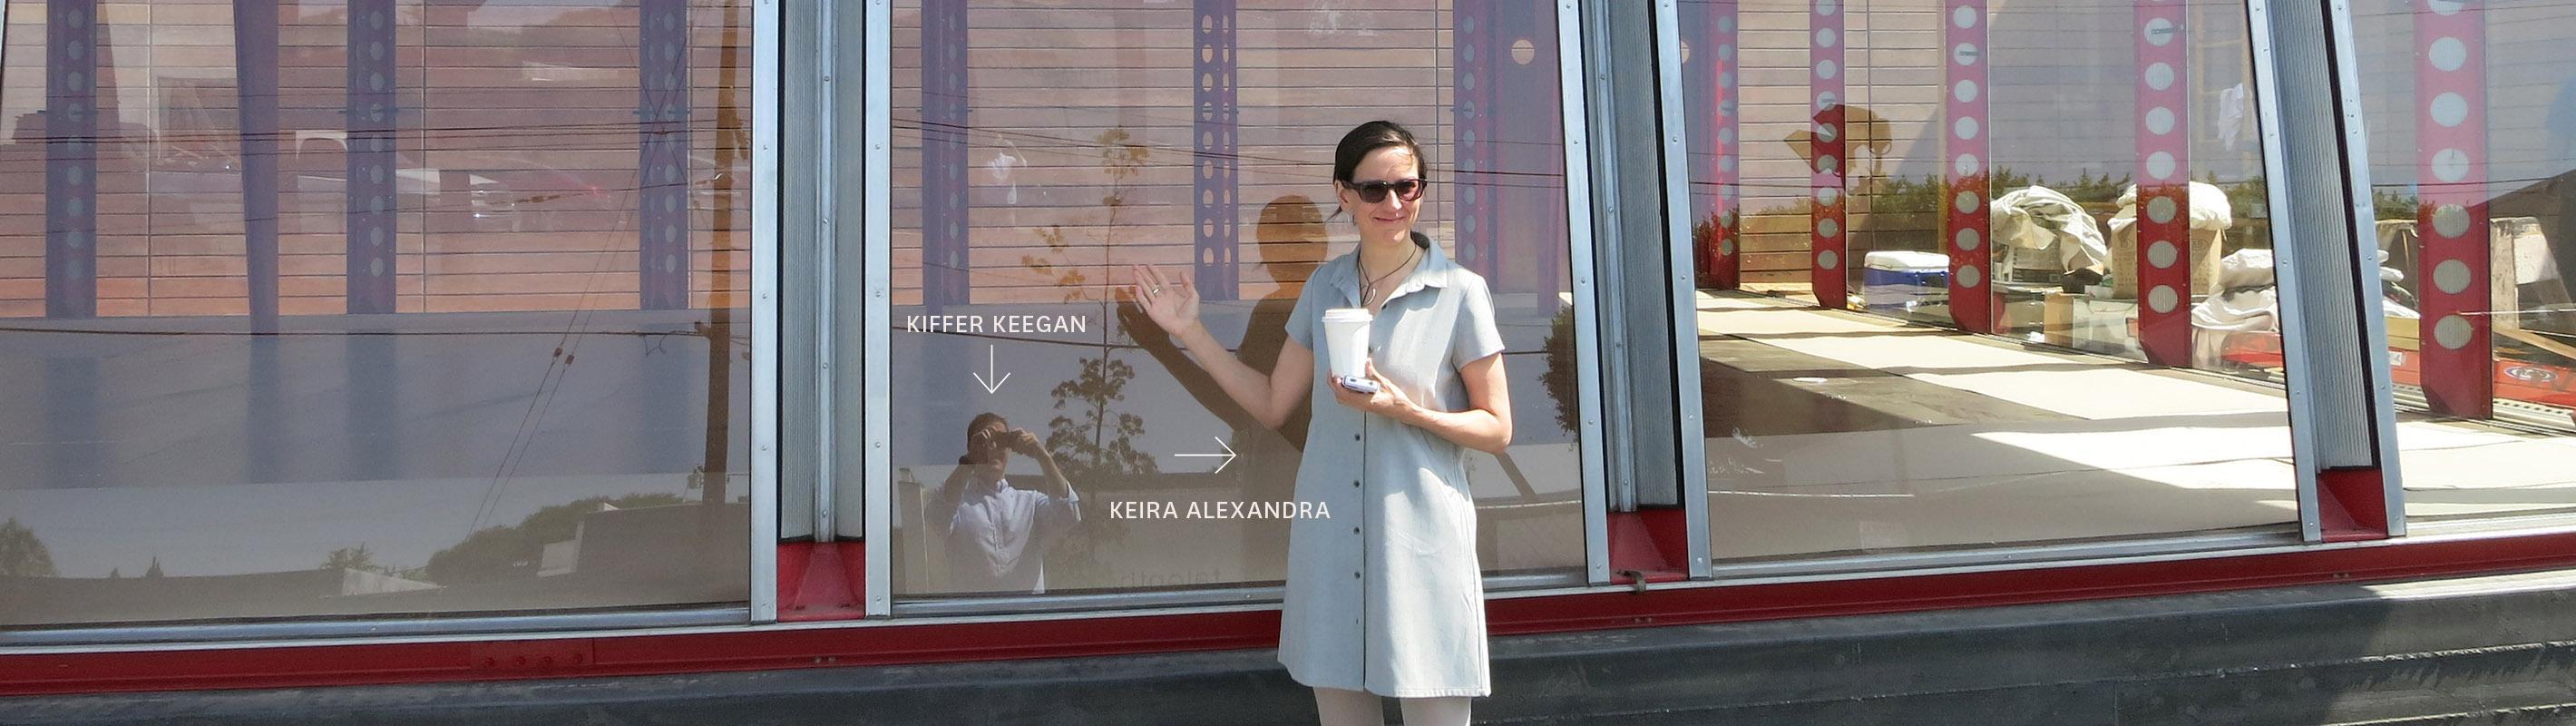 Work-Order_about_keira_alexandra_kiffer_keegan